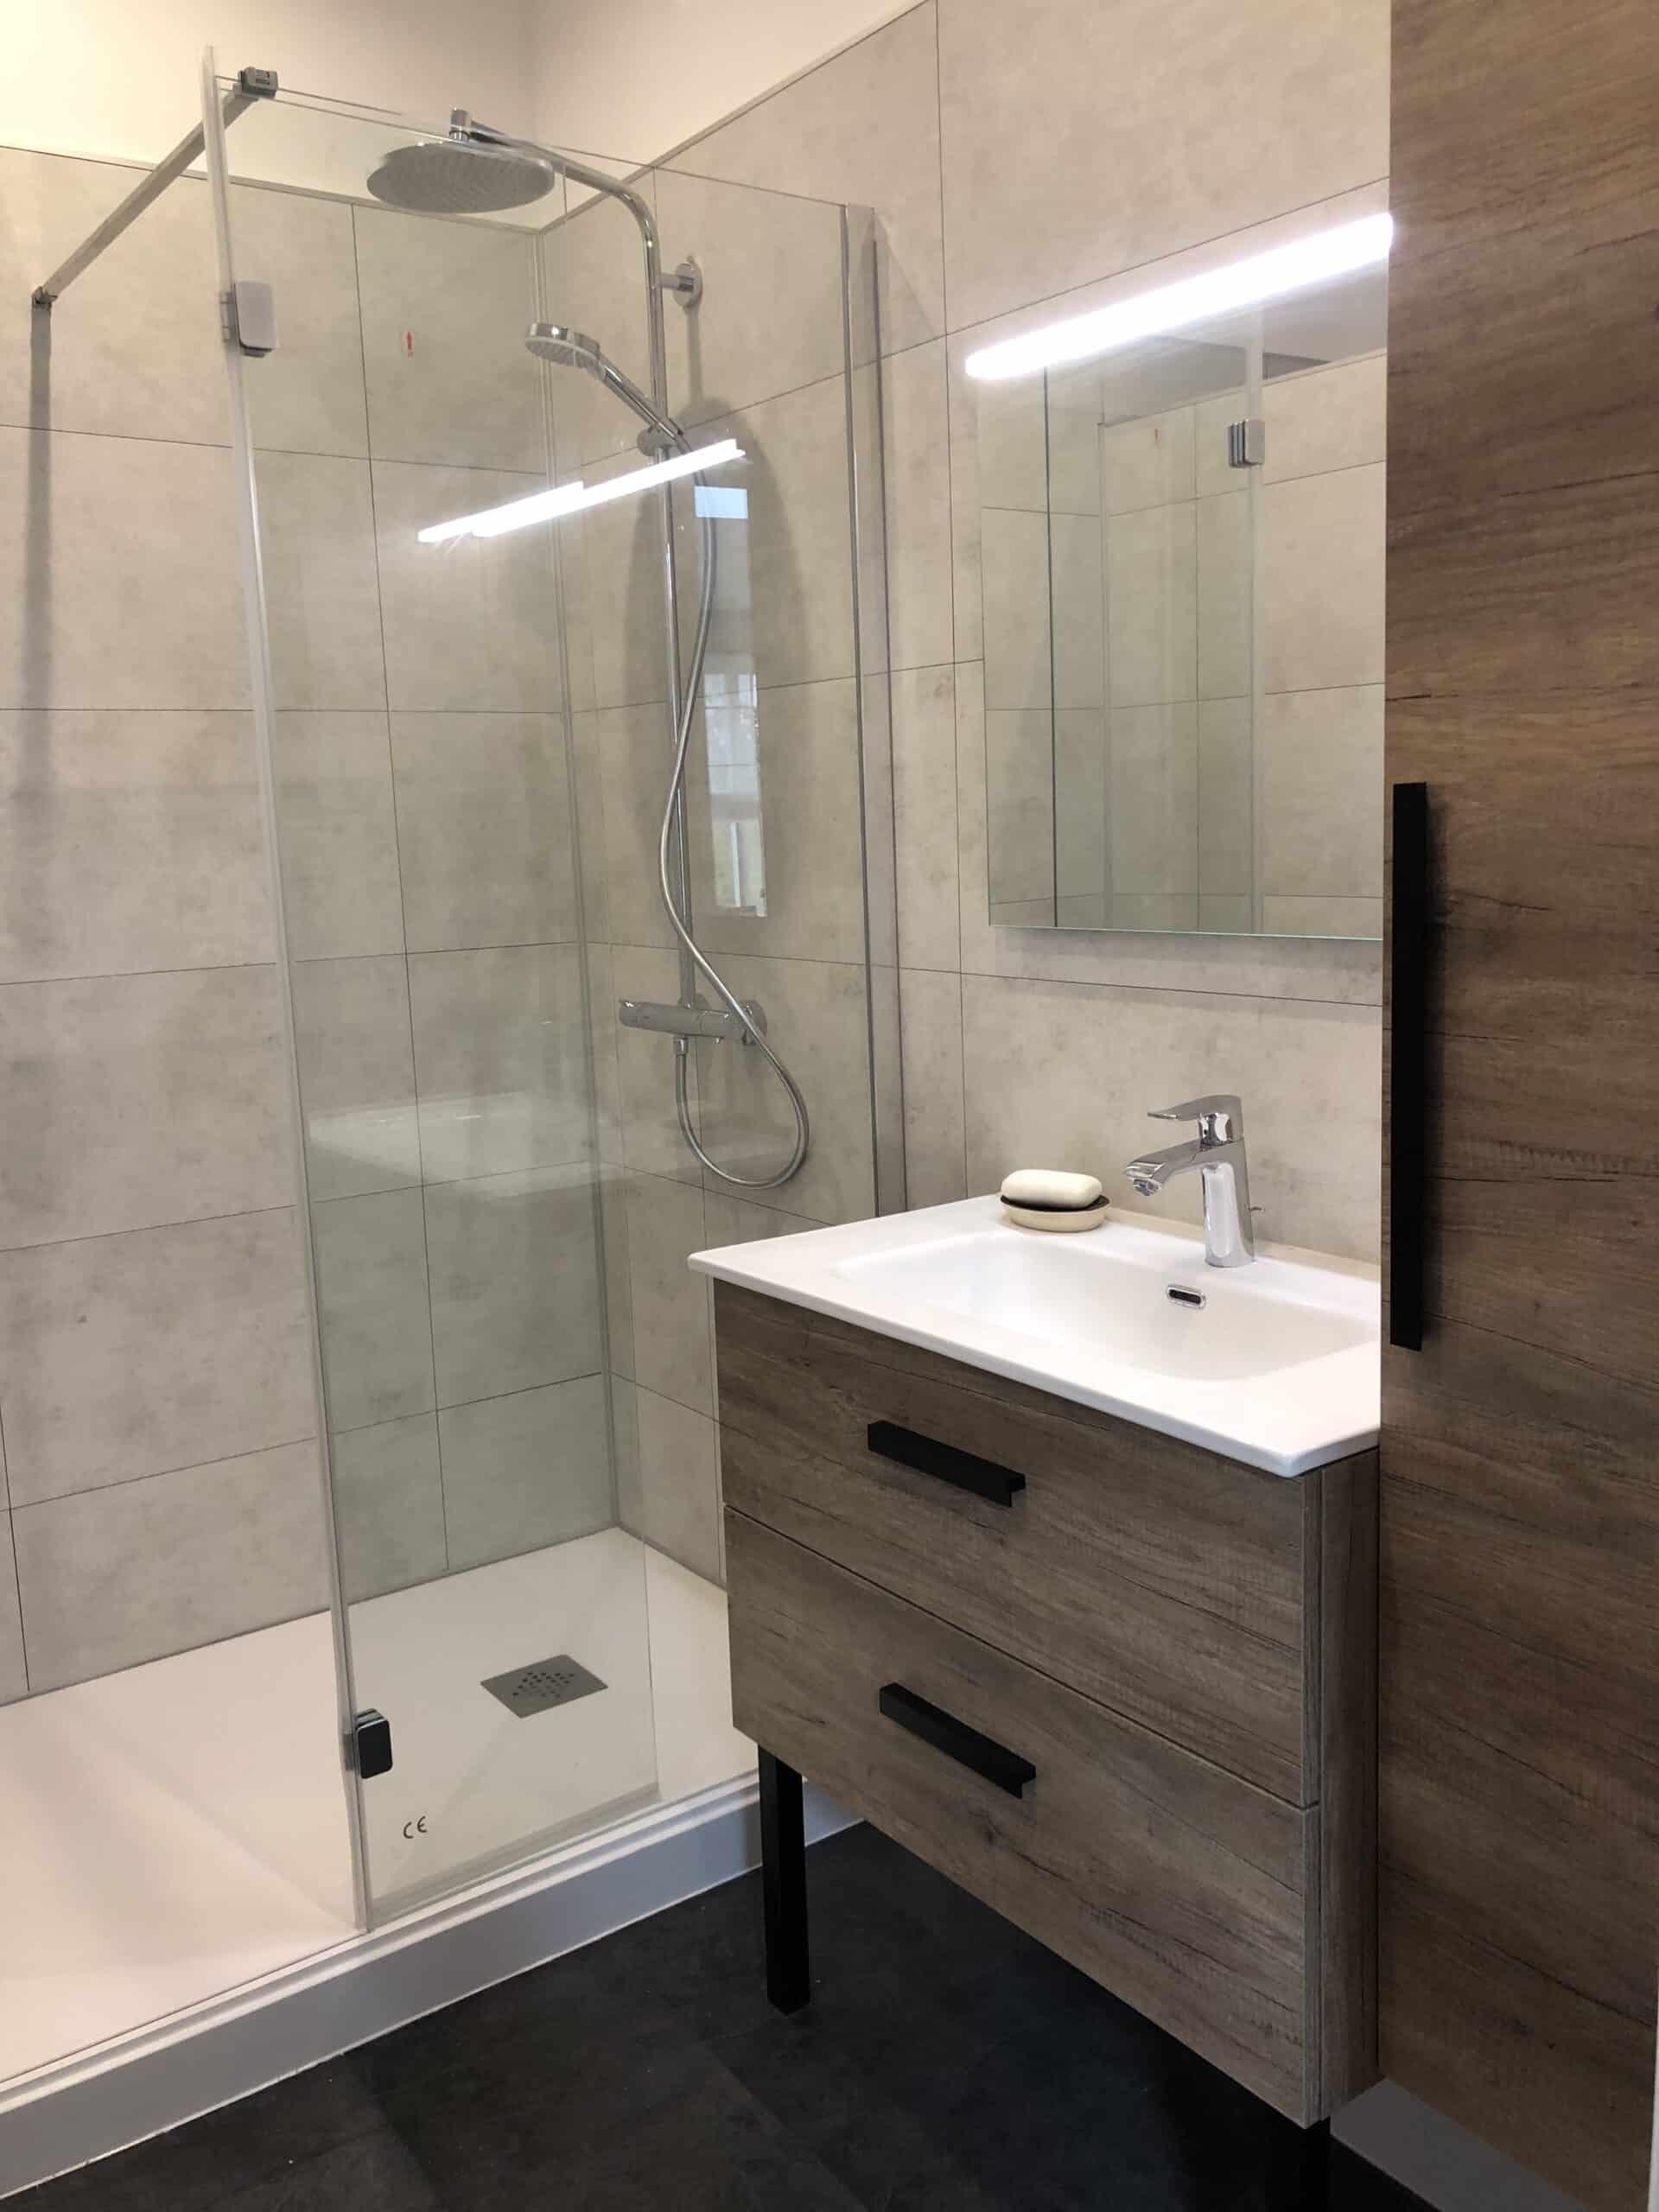 Rénovation salle de bain moderne douche italienne meuble vasque